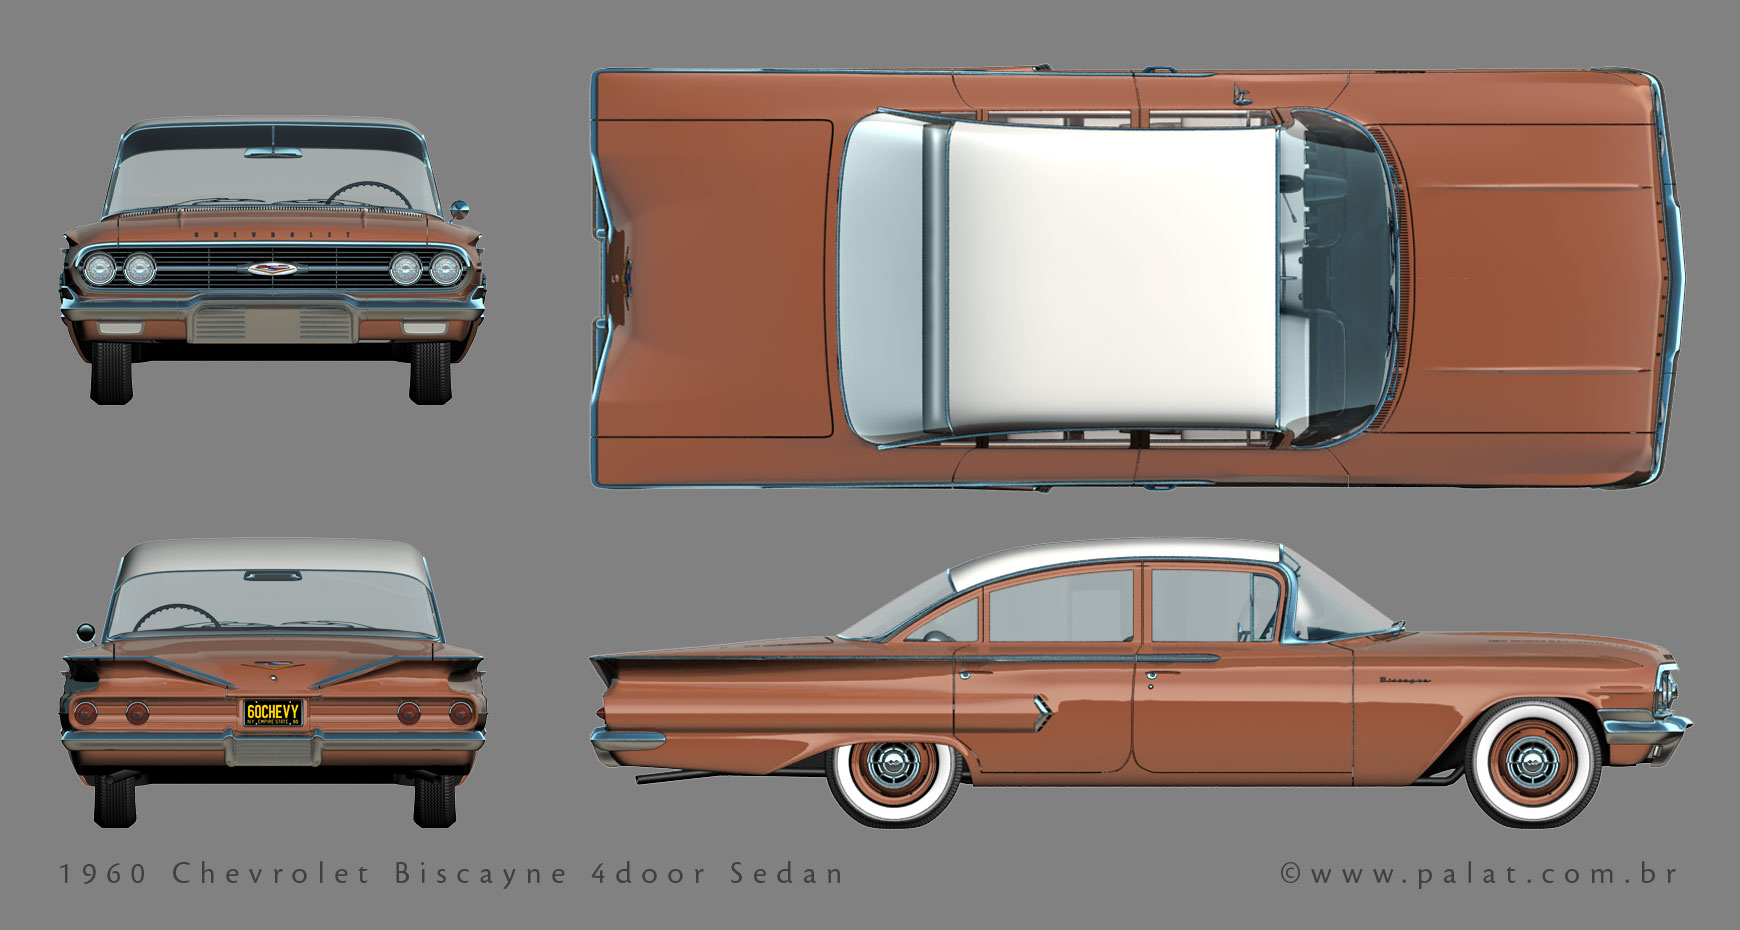 chevrolet biscayne 4 door sedan specs photos videos and more on topworldauto. Black Bedroom Furniture Sets. Home Design Ideas